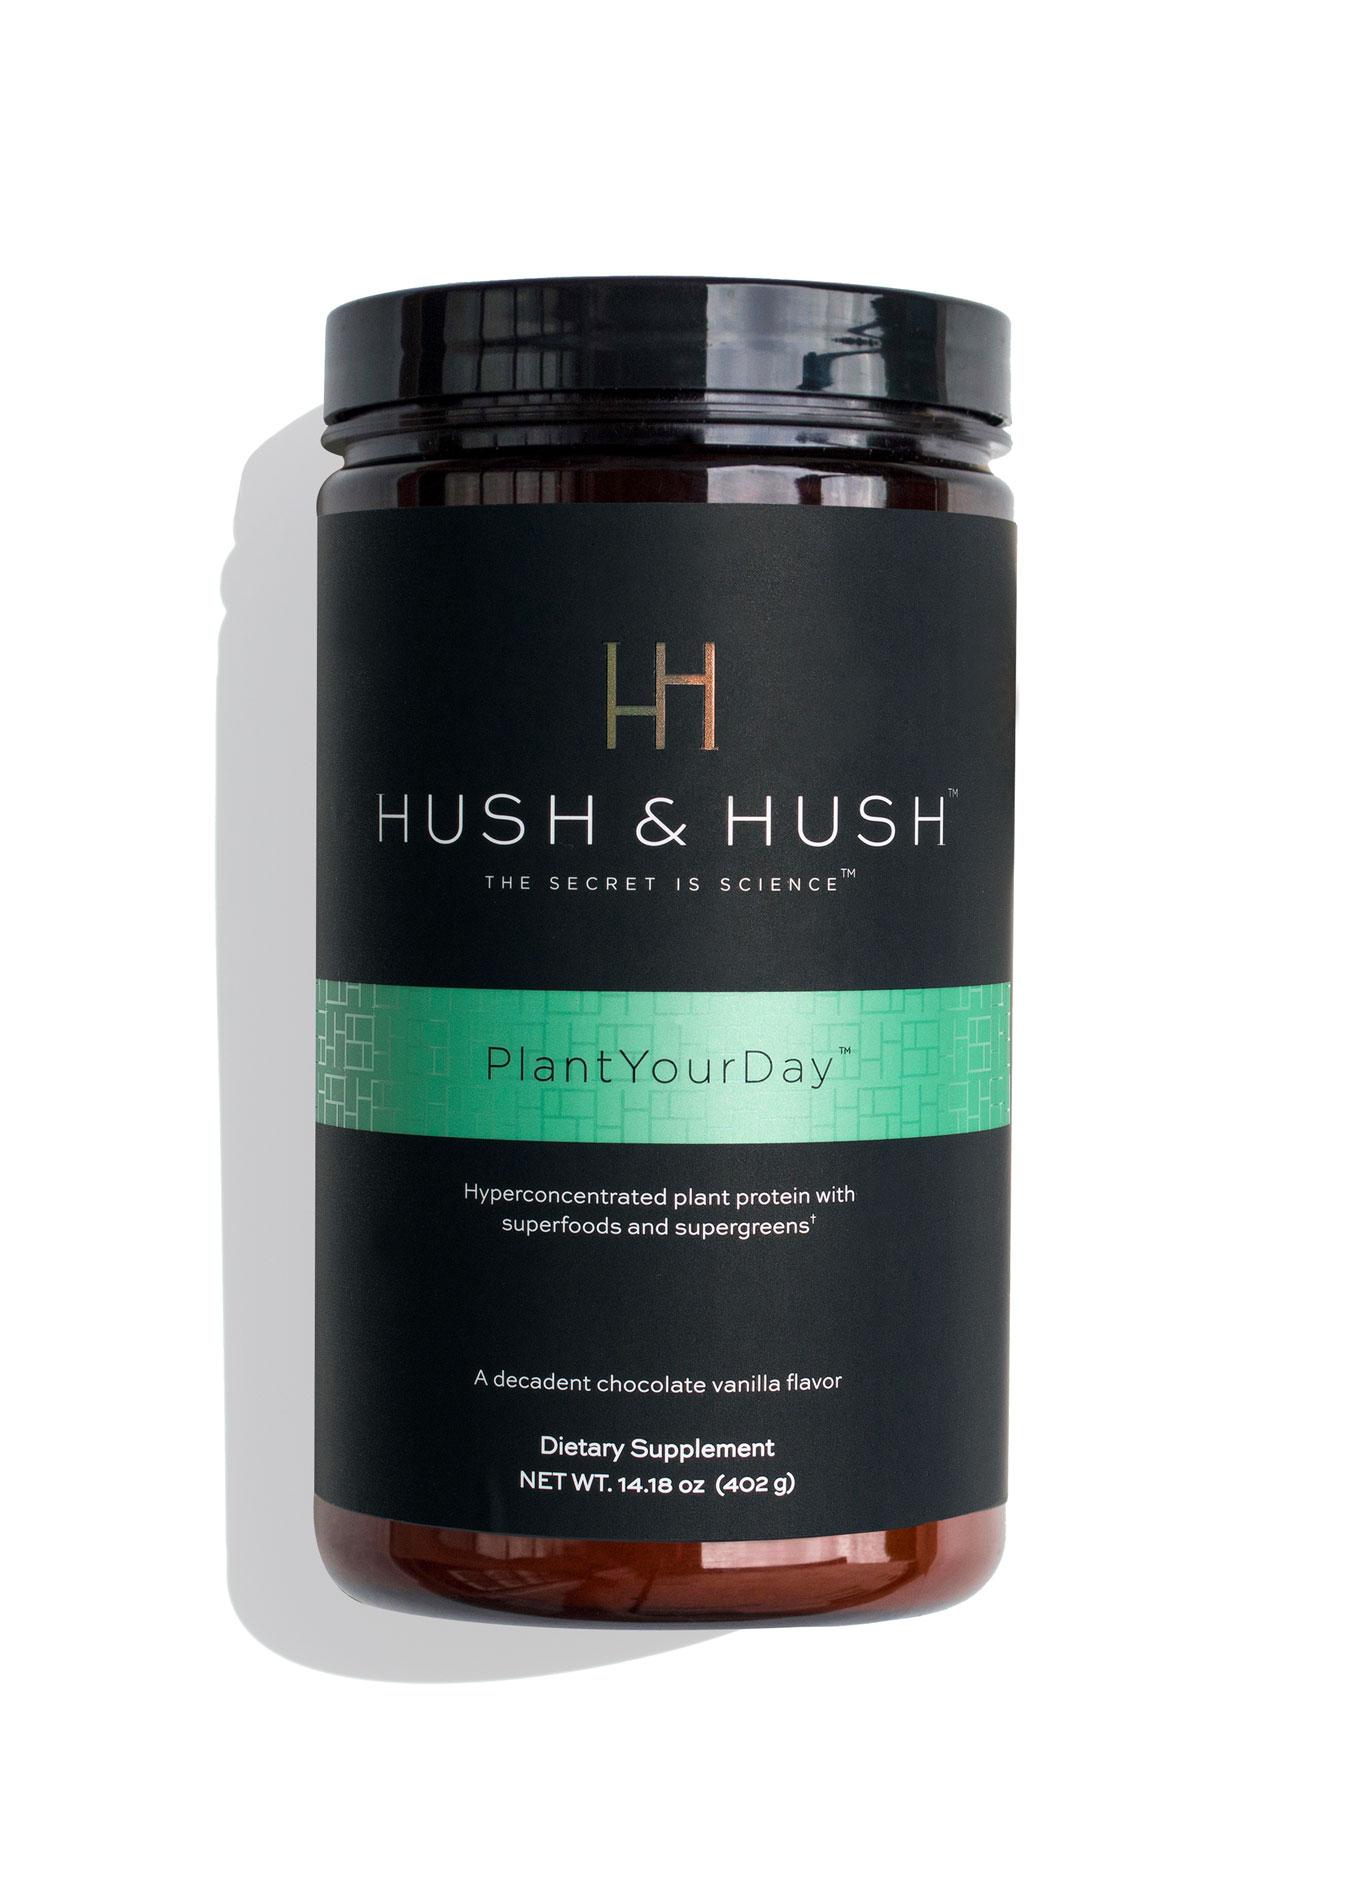 Hush & Hush: 20% off sitewide